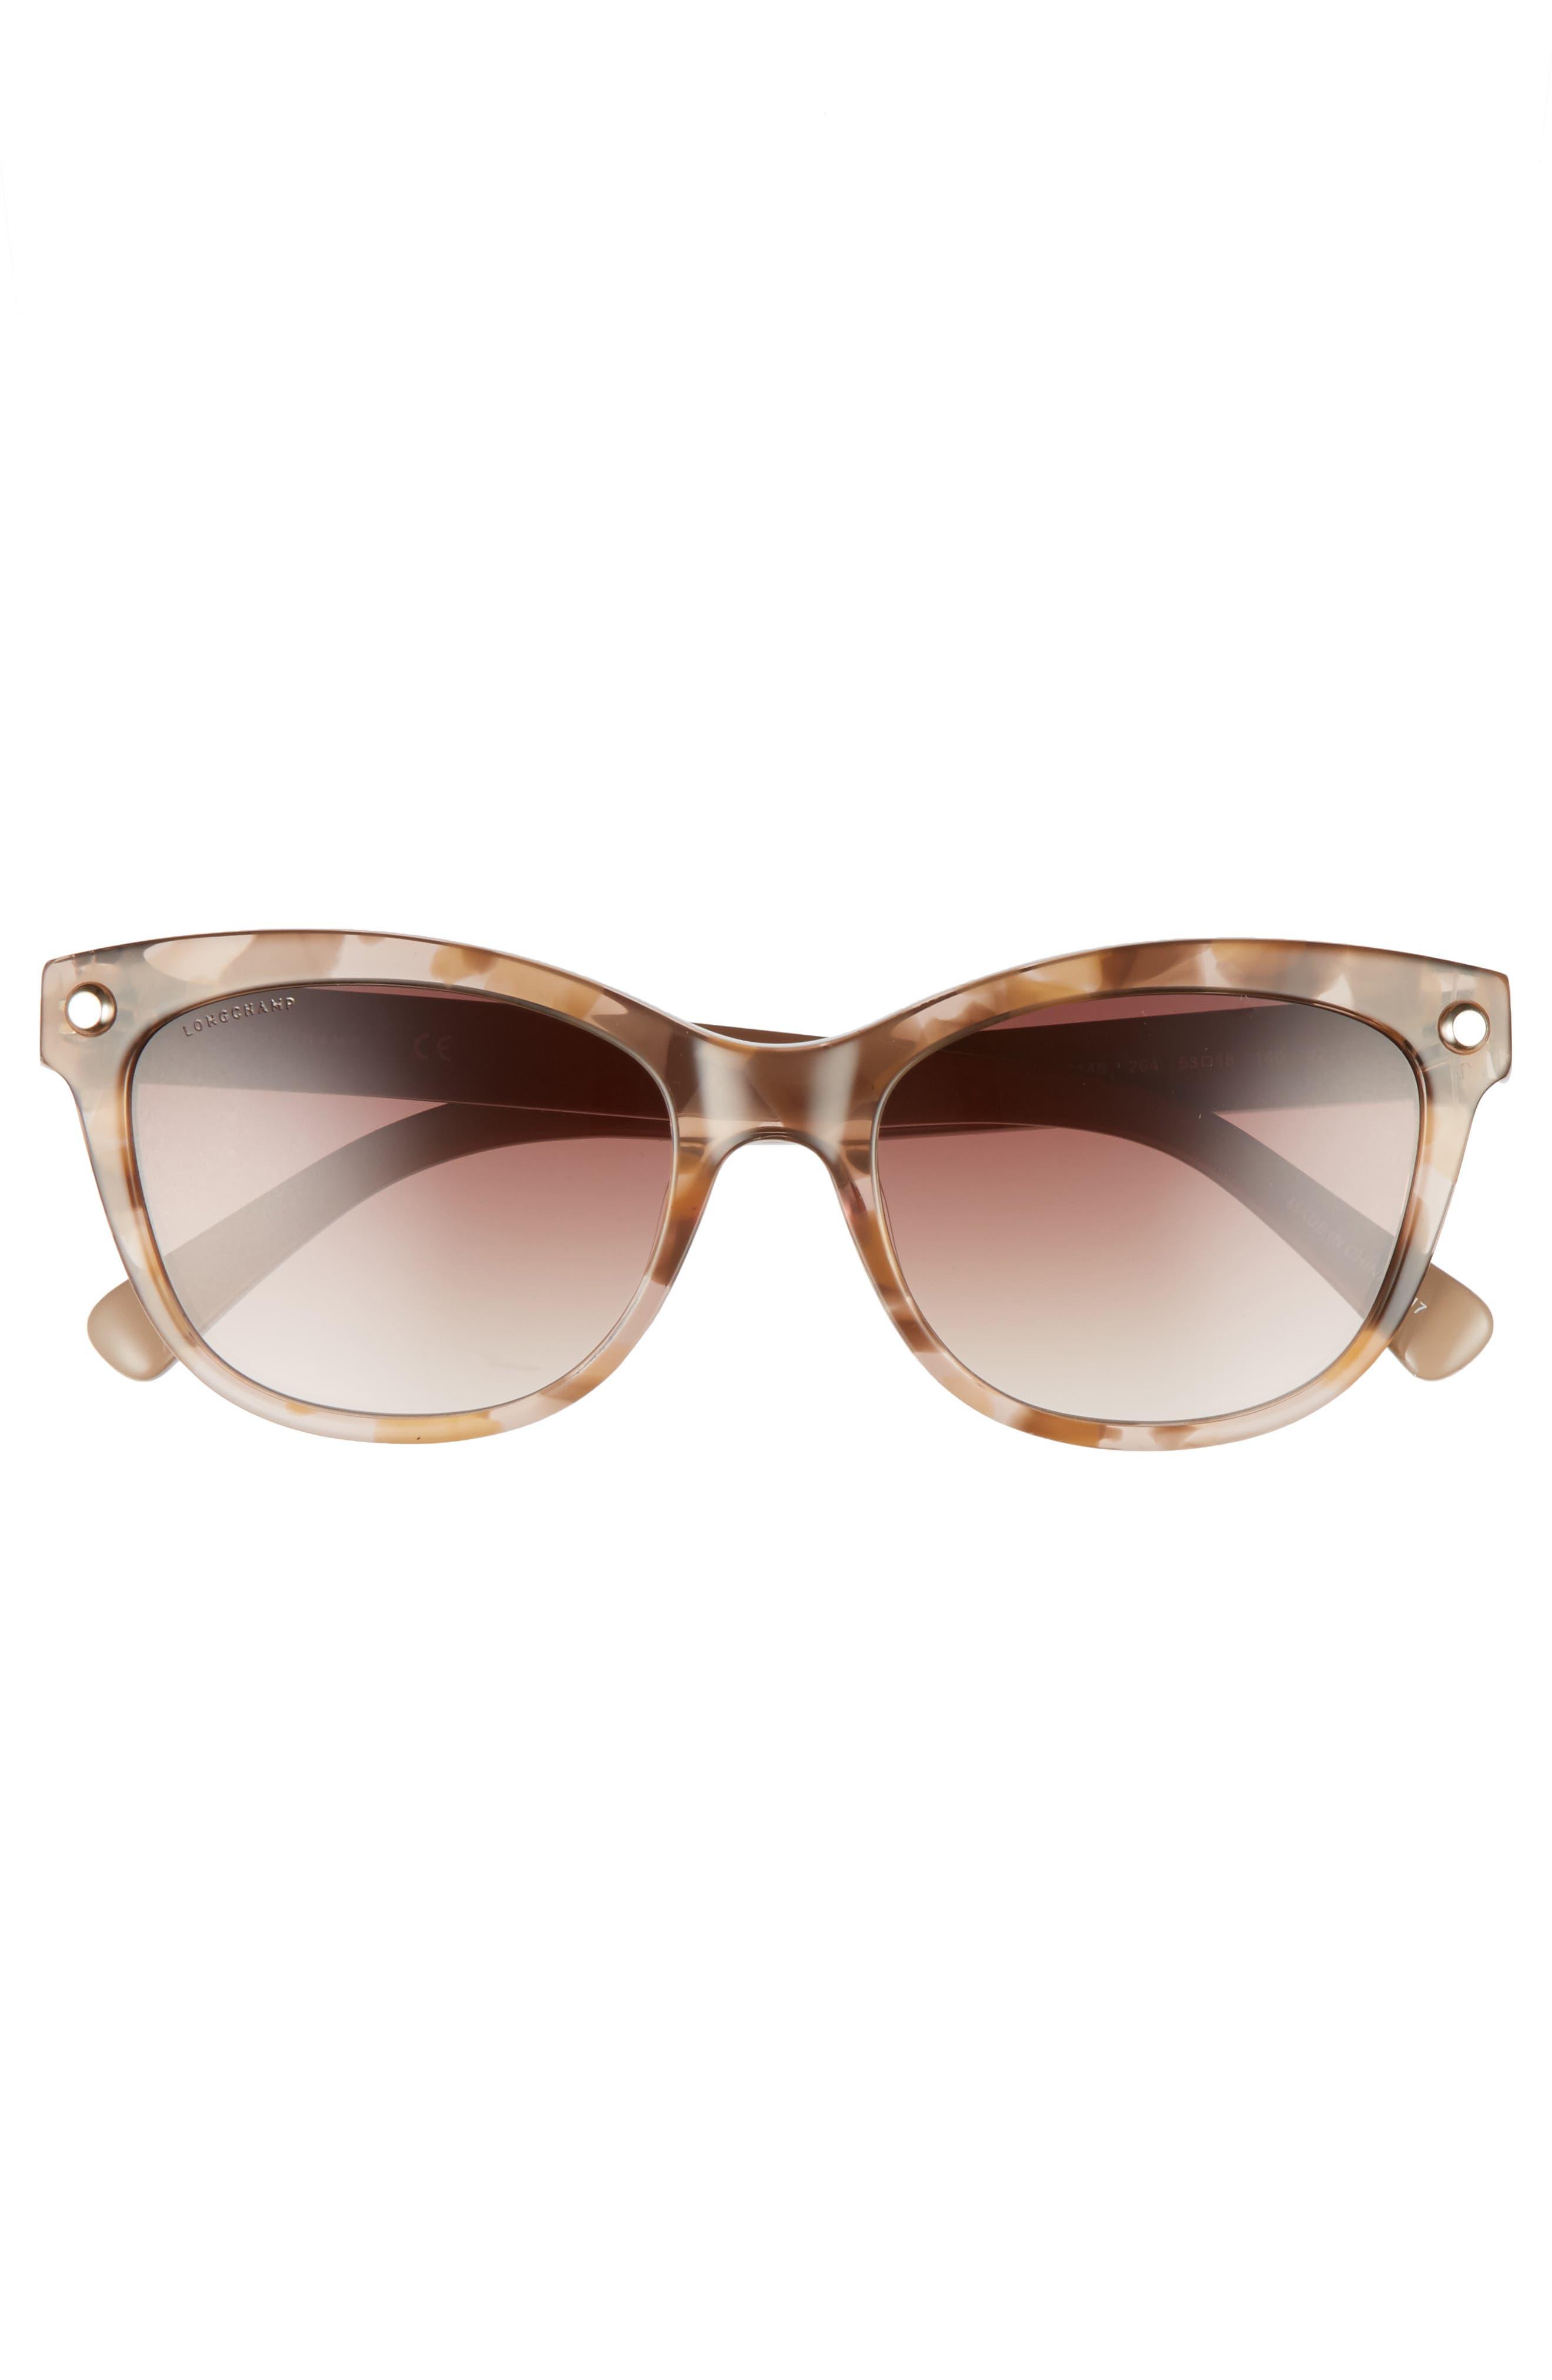 53mm Gradient Lens Cat Eye Sunglasses,                             Alternate thumbnail 3, color,                             MARBLE BEIGE